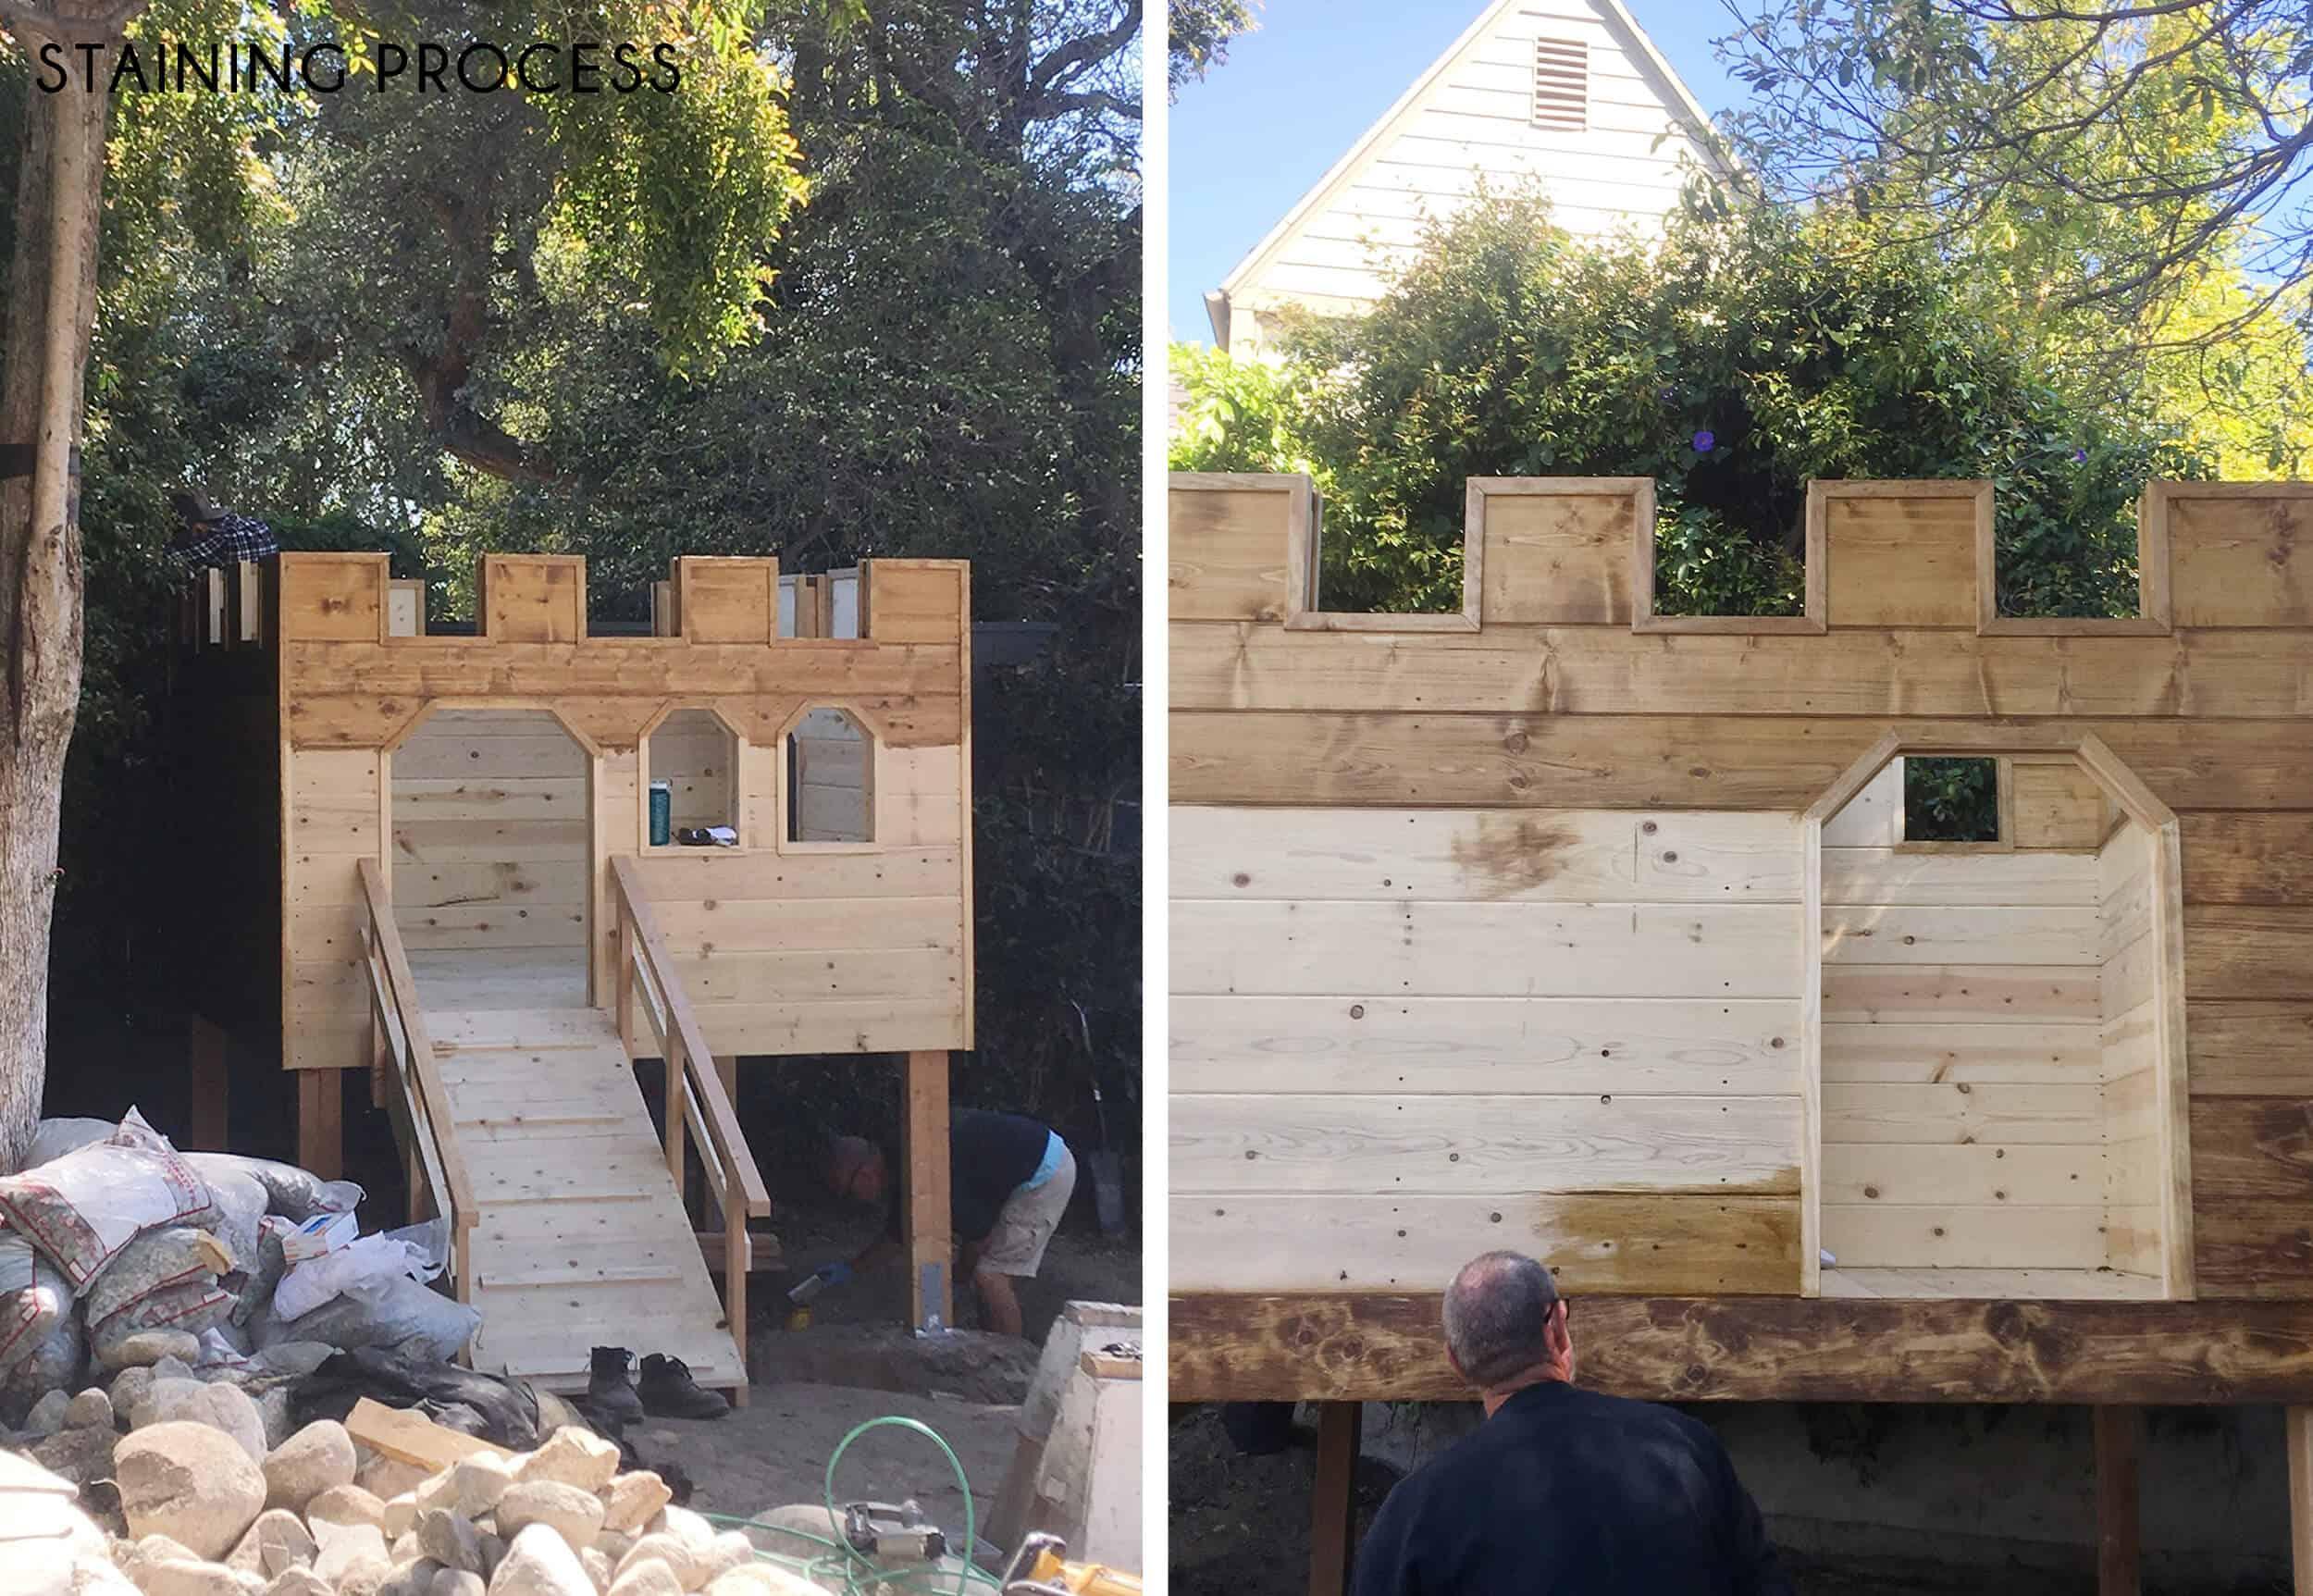 Emily-Henderson_Waverly_Backyard_Playfort_Castle_Staining-Process